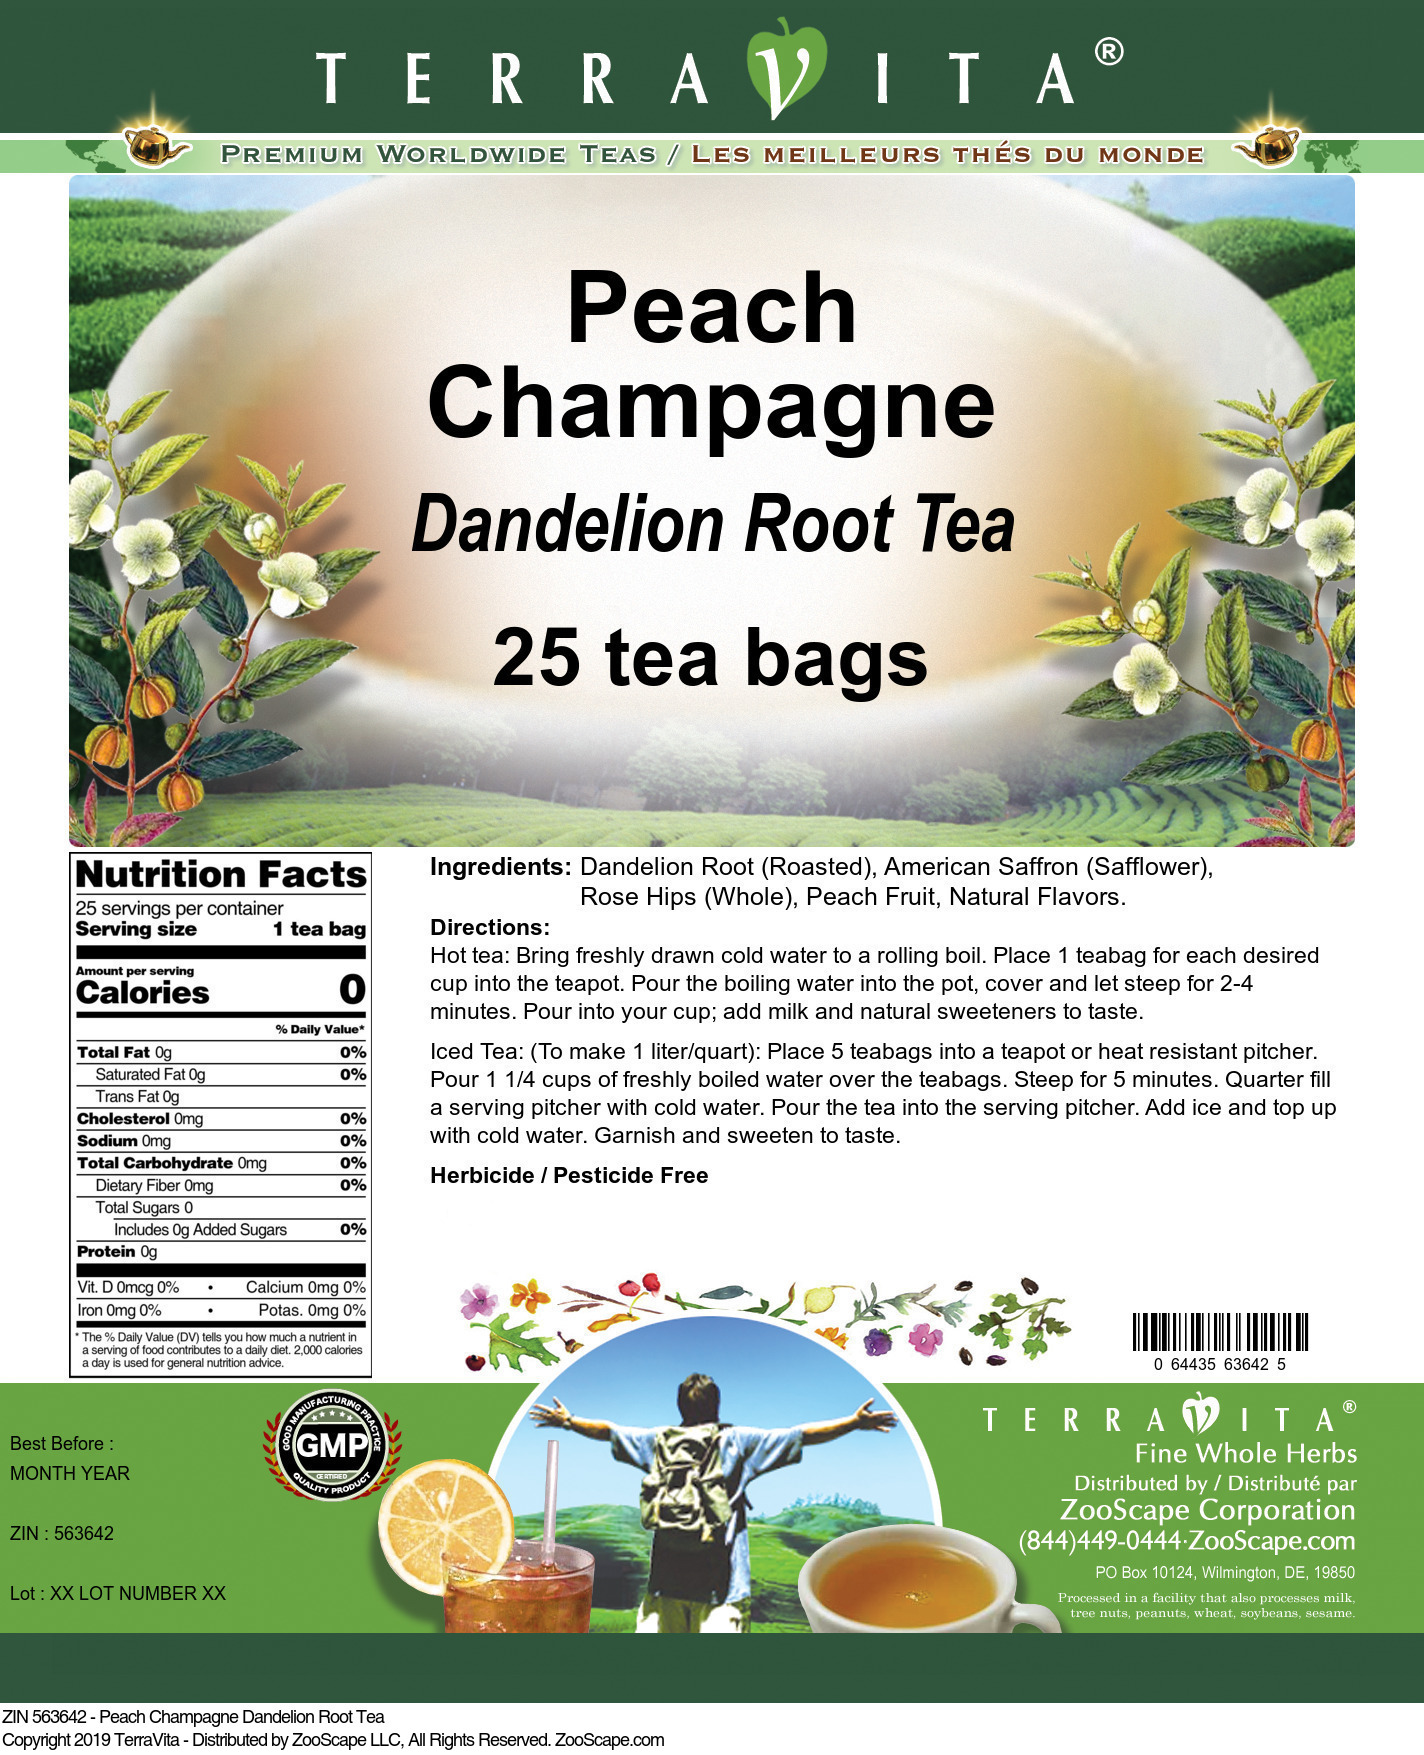 Peach Champagne Dandelion Root Tea